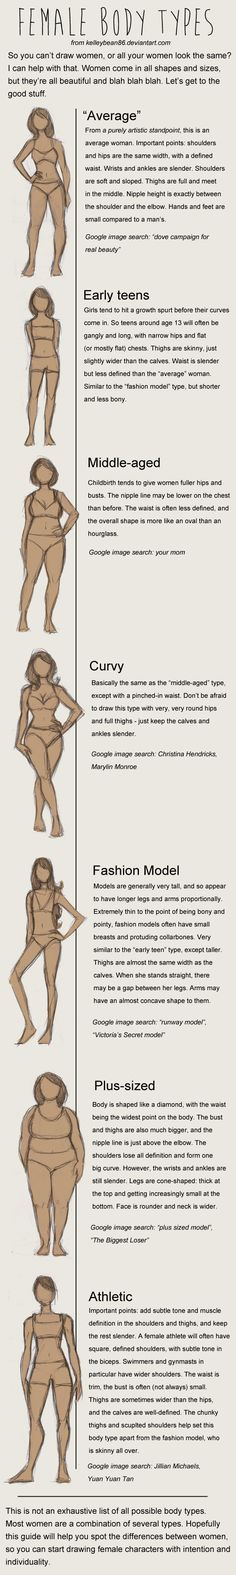 Draw Female Body Types by kelleybean86.deviantart.com